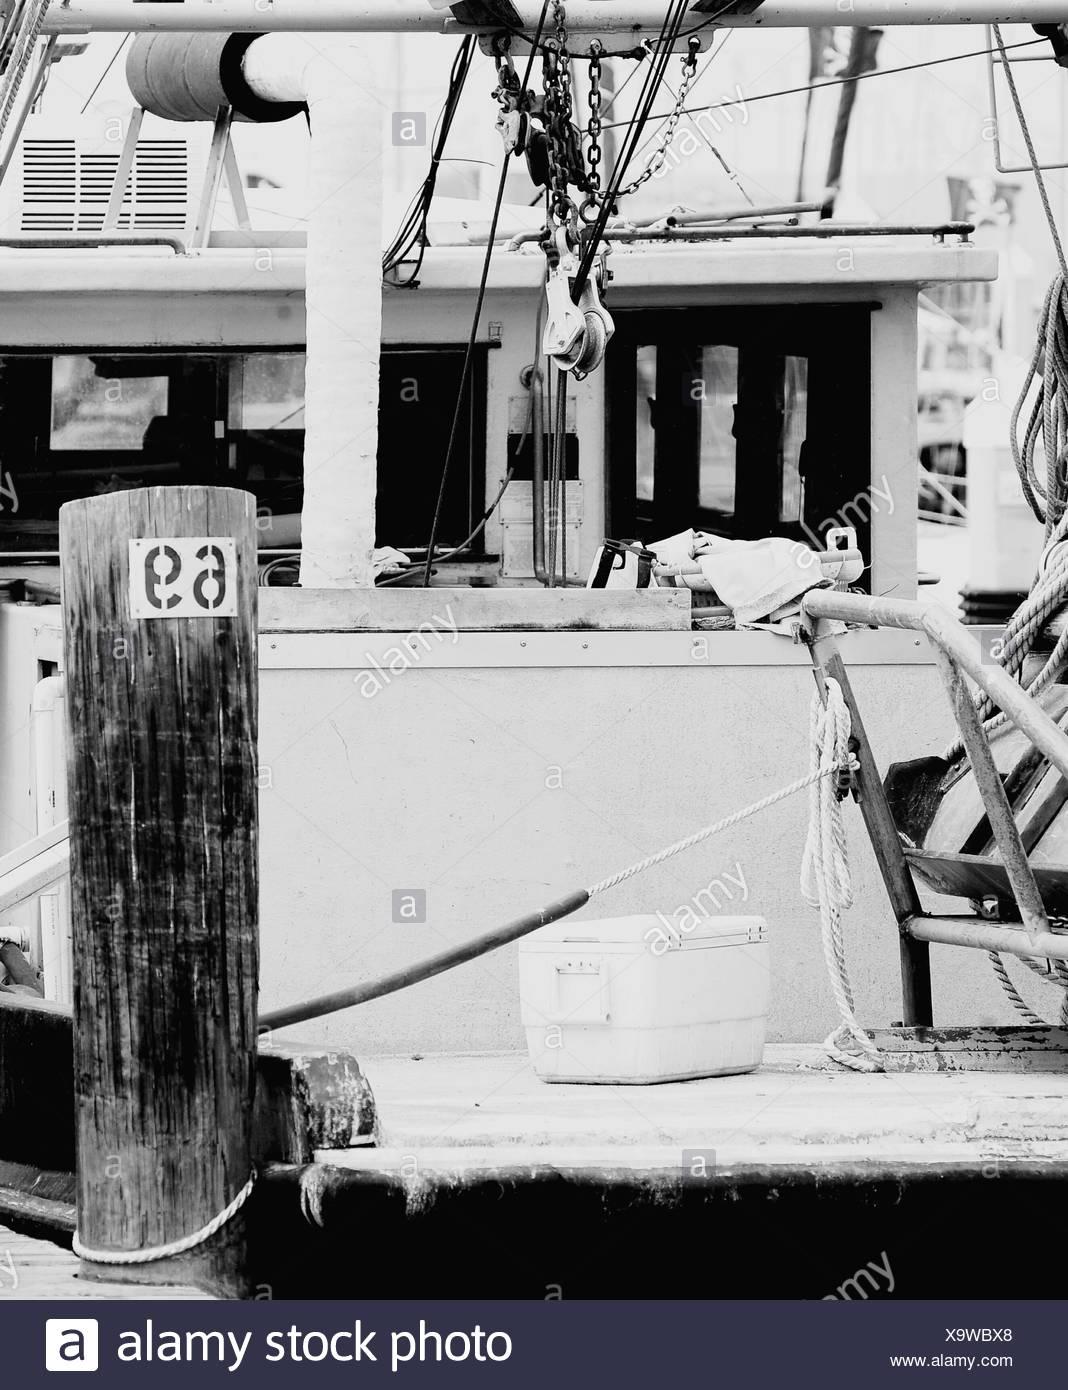 Moored Nautical Vessel - Stock Image